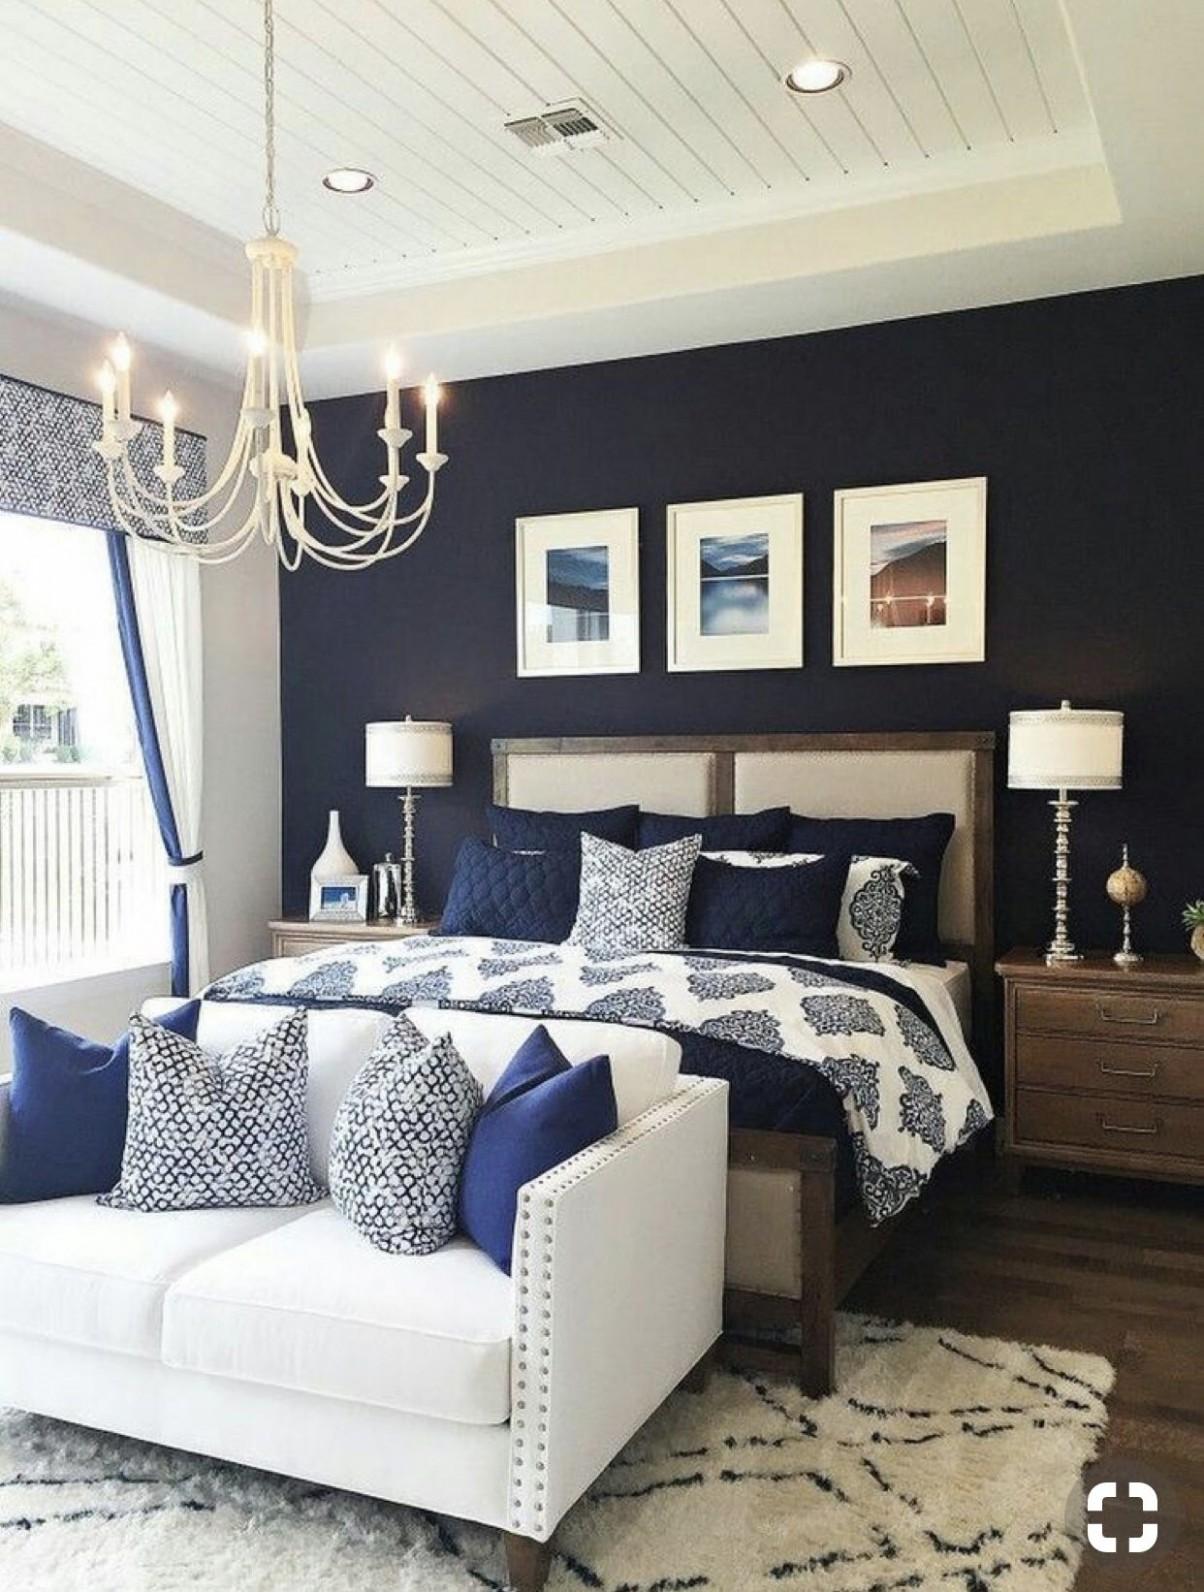 Master bedroom elegance  Small master bedroom, Master bedrooms  - Bedroom Ideas Navy And Grey